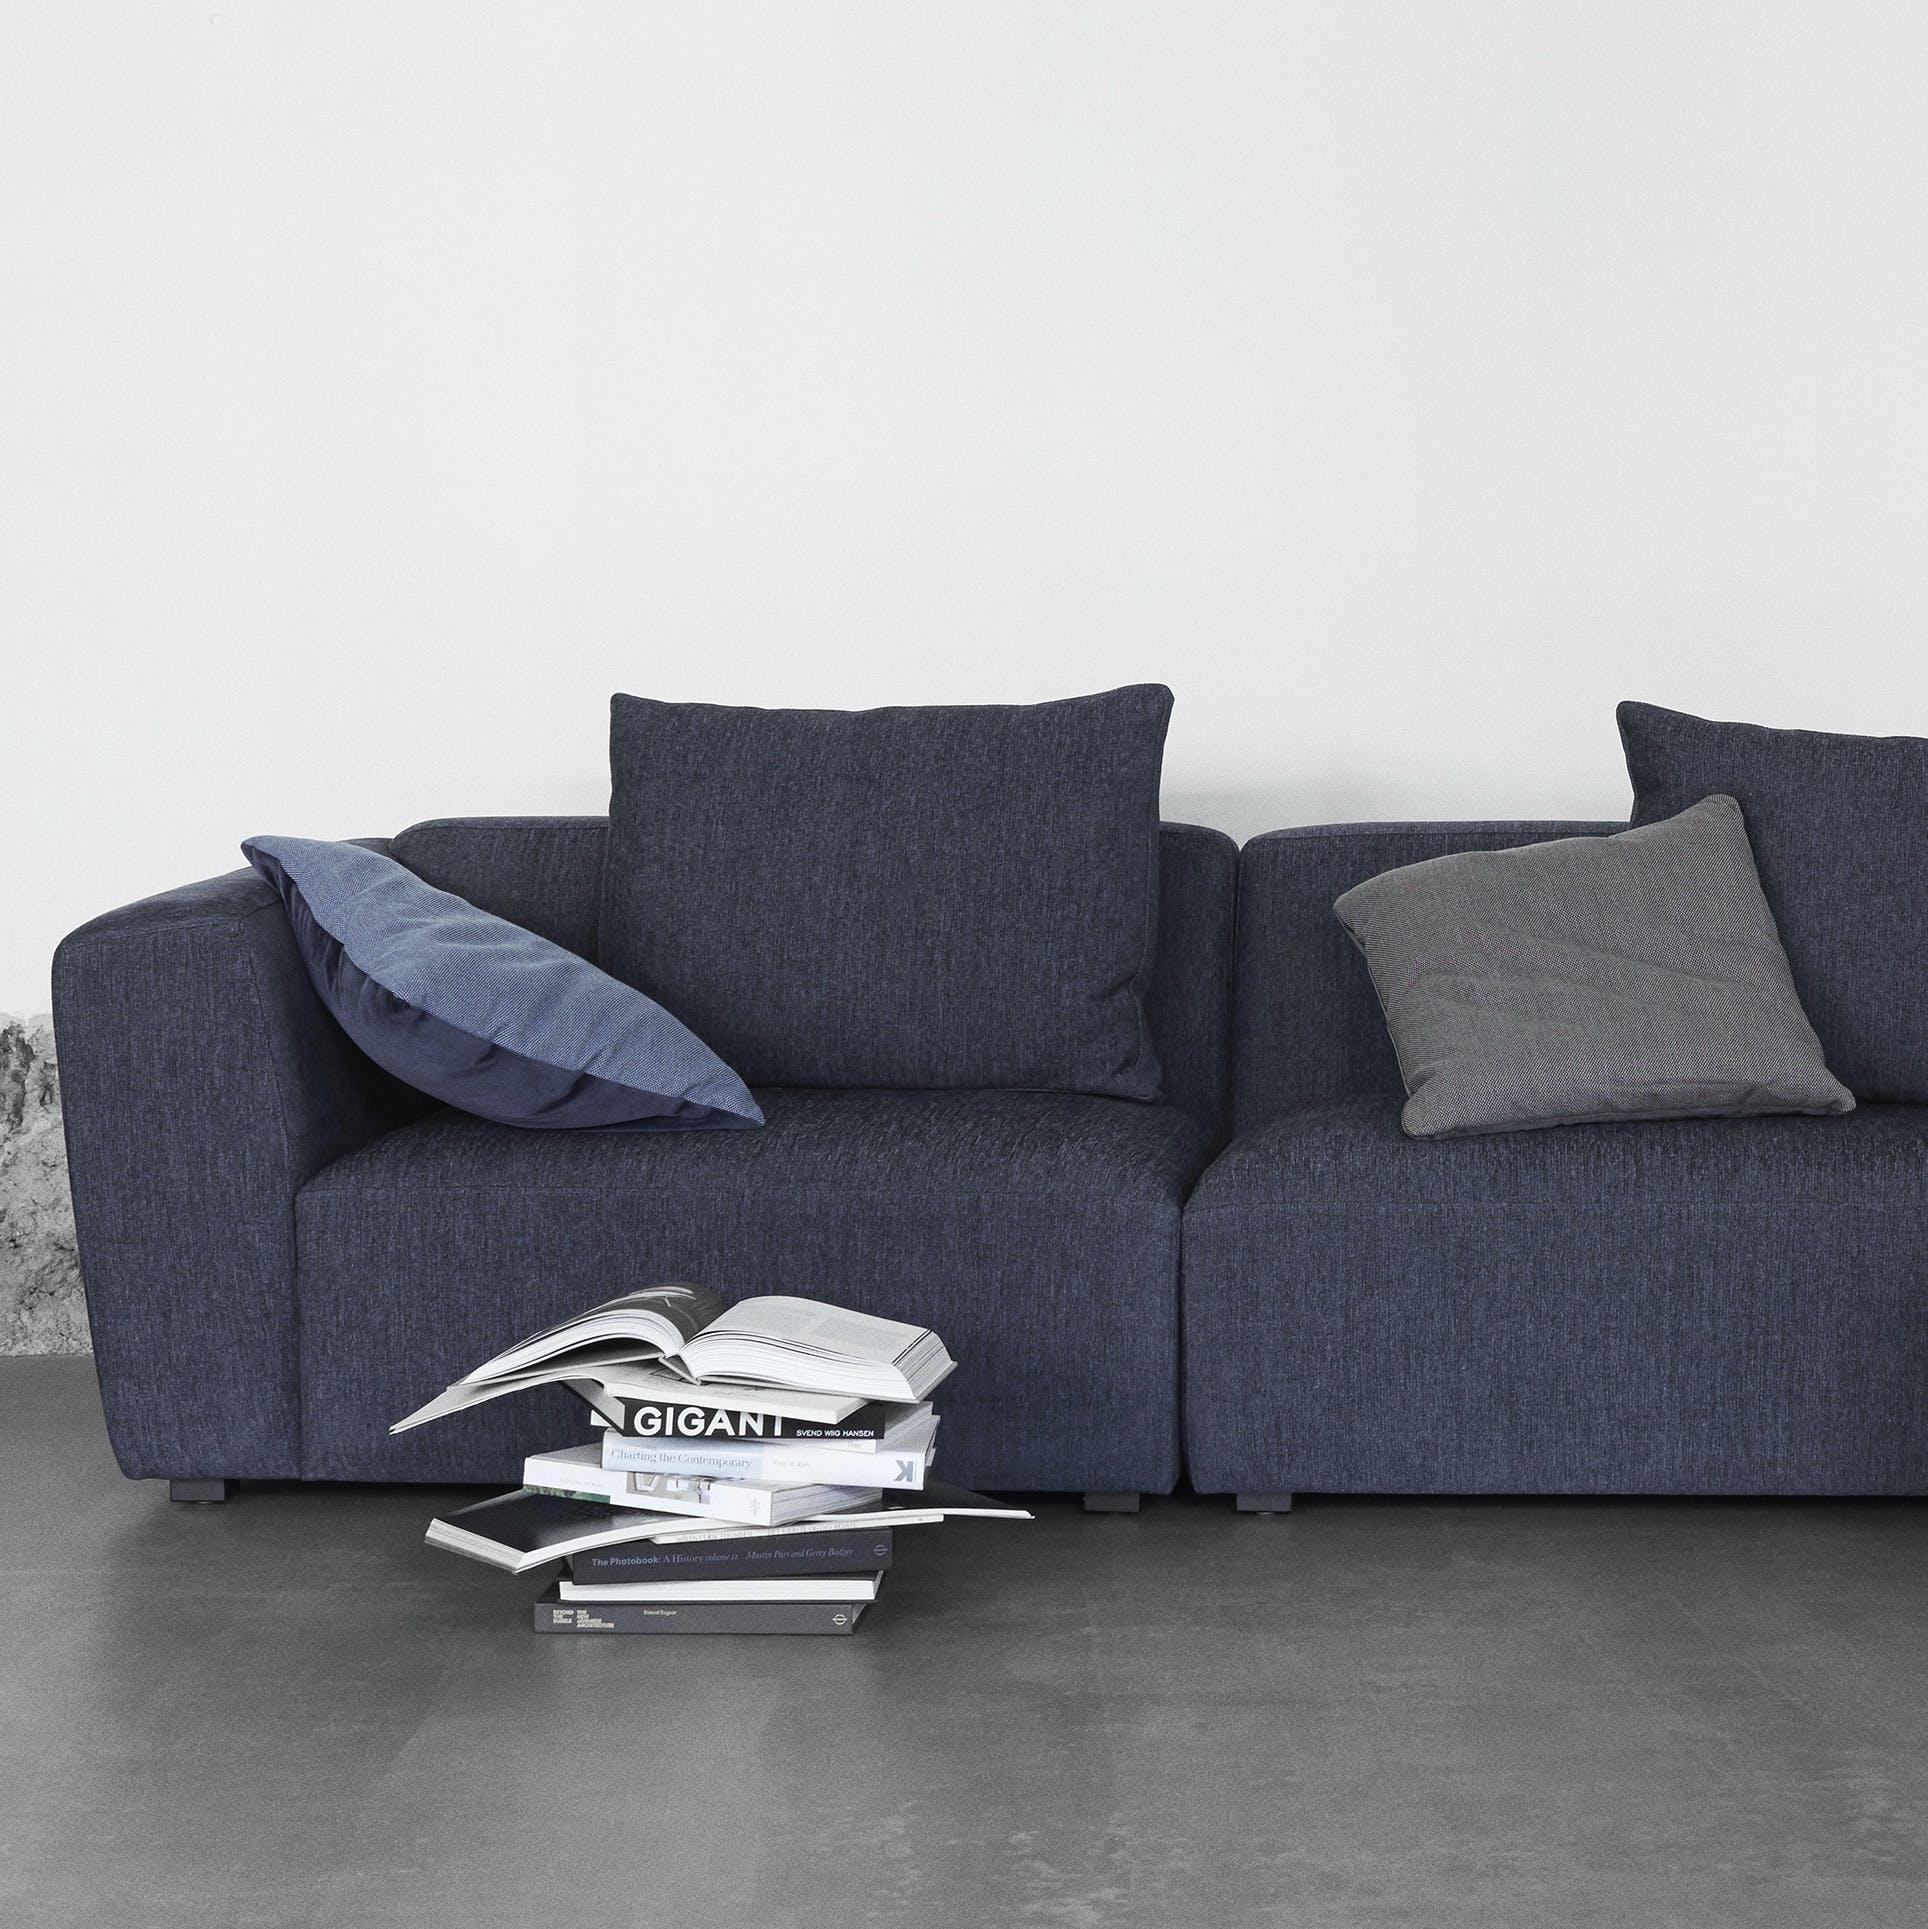 Wendelbo-front-domino-sofa-institu-haute-living_190403_145521